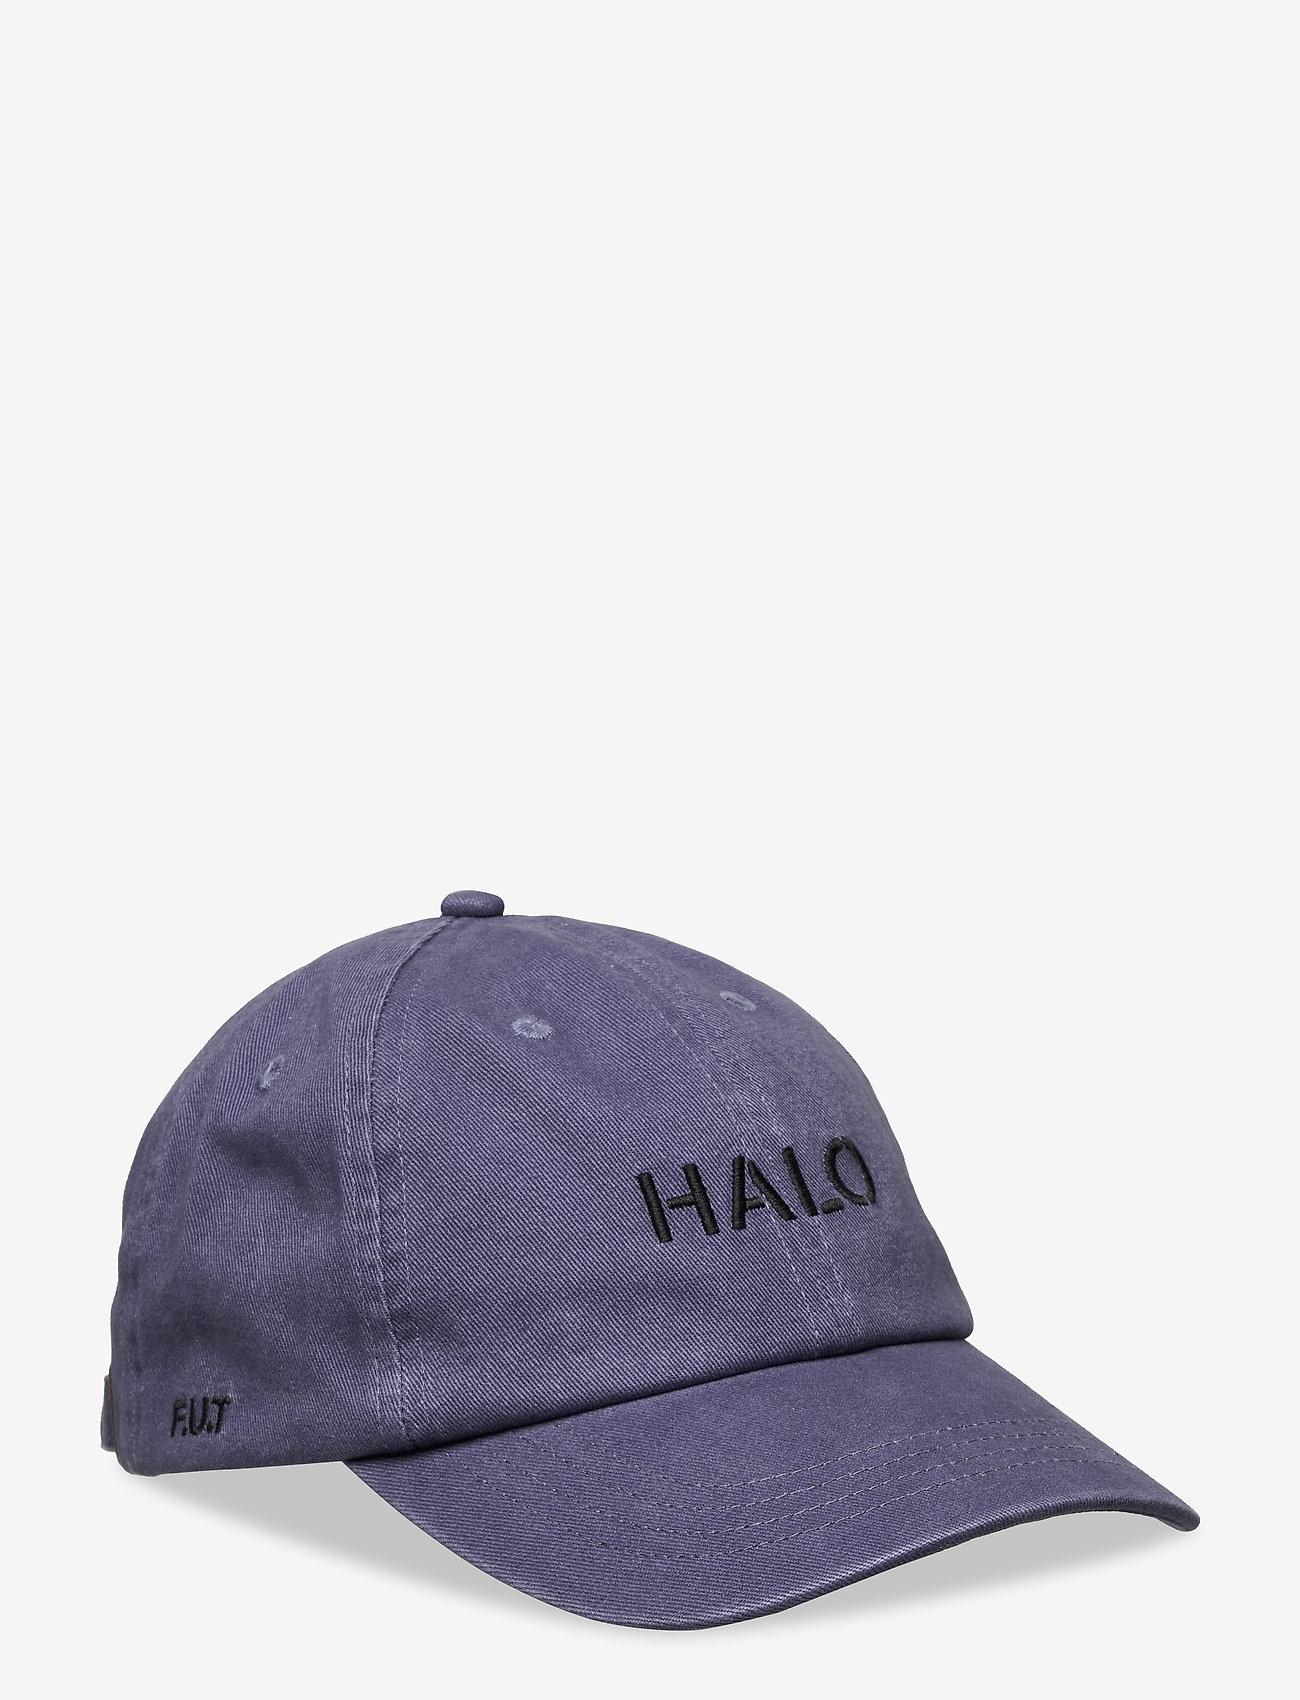 HALO - HALO CAP - caps - blue - 0